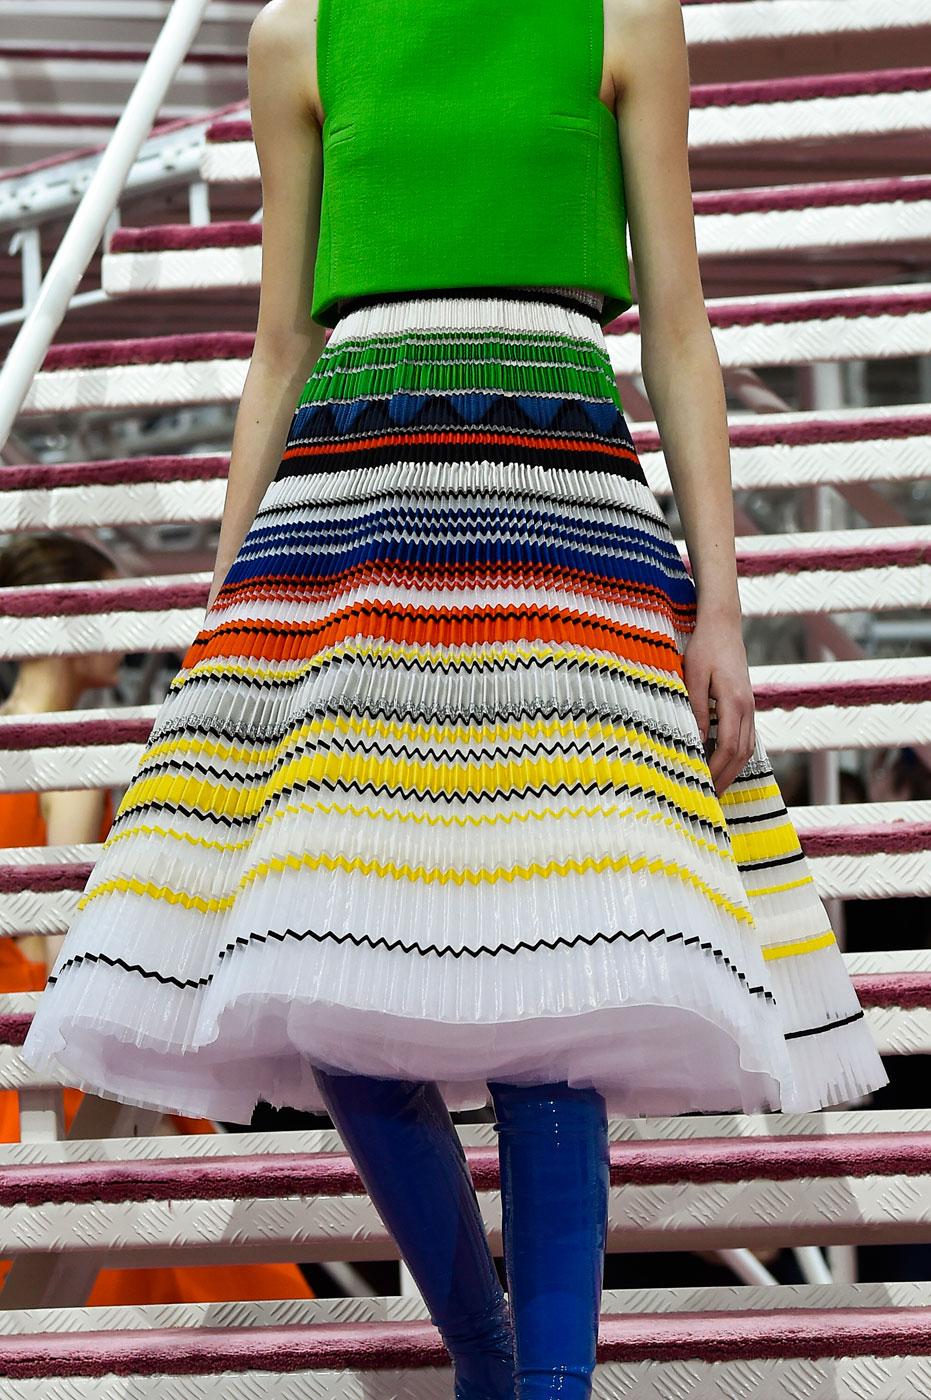 Christian-Dior-fashion-runway-show-close-ups-haute-couture-paris-spring-summer-2015-the-impression-123